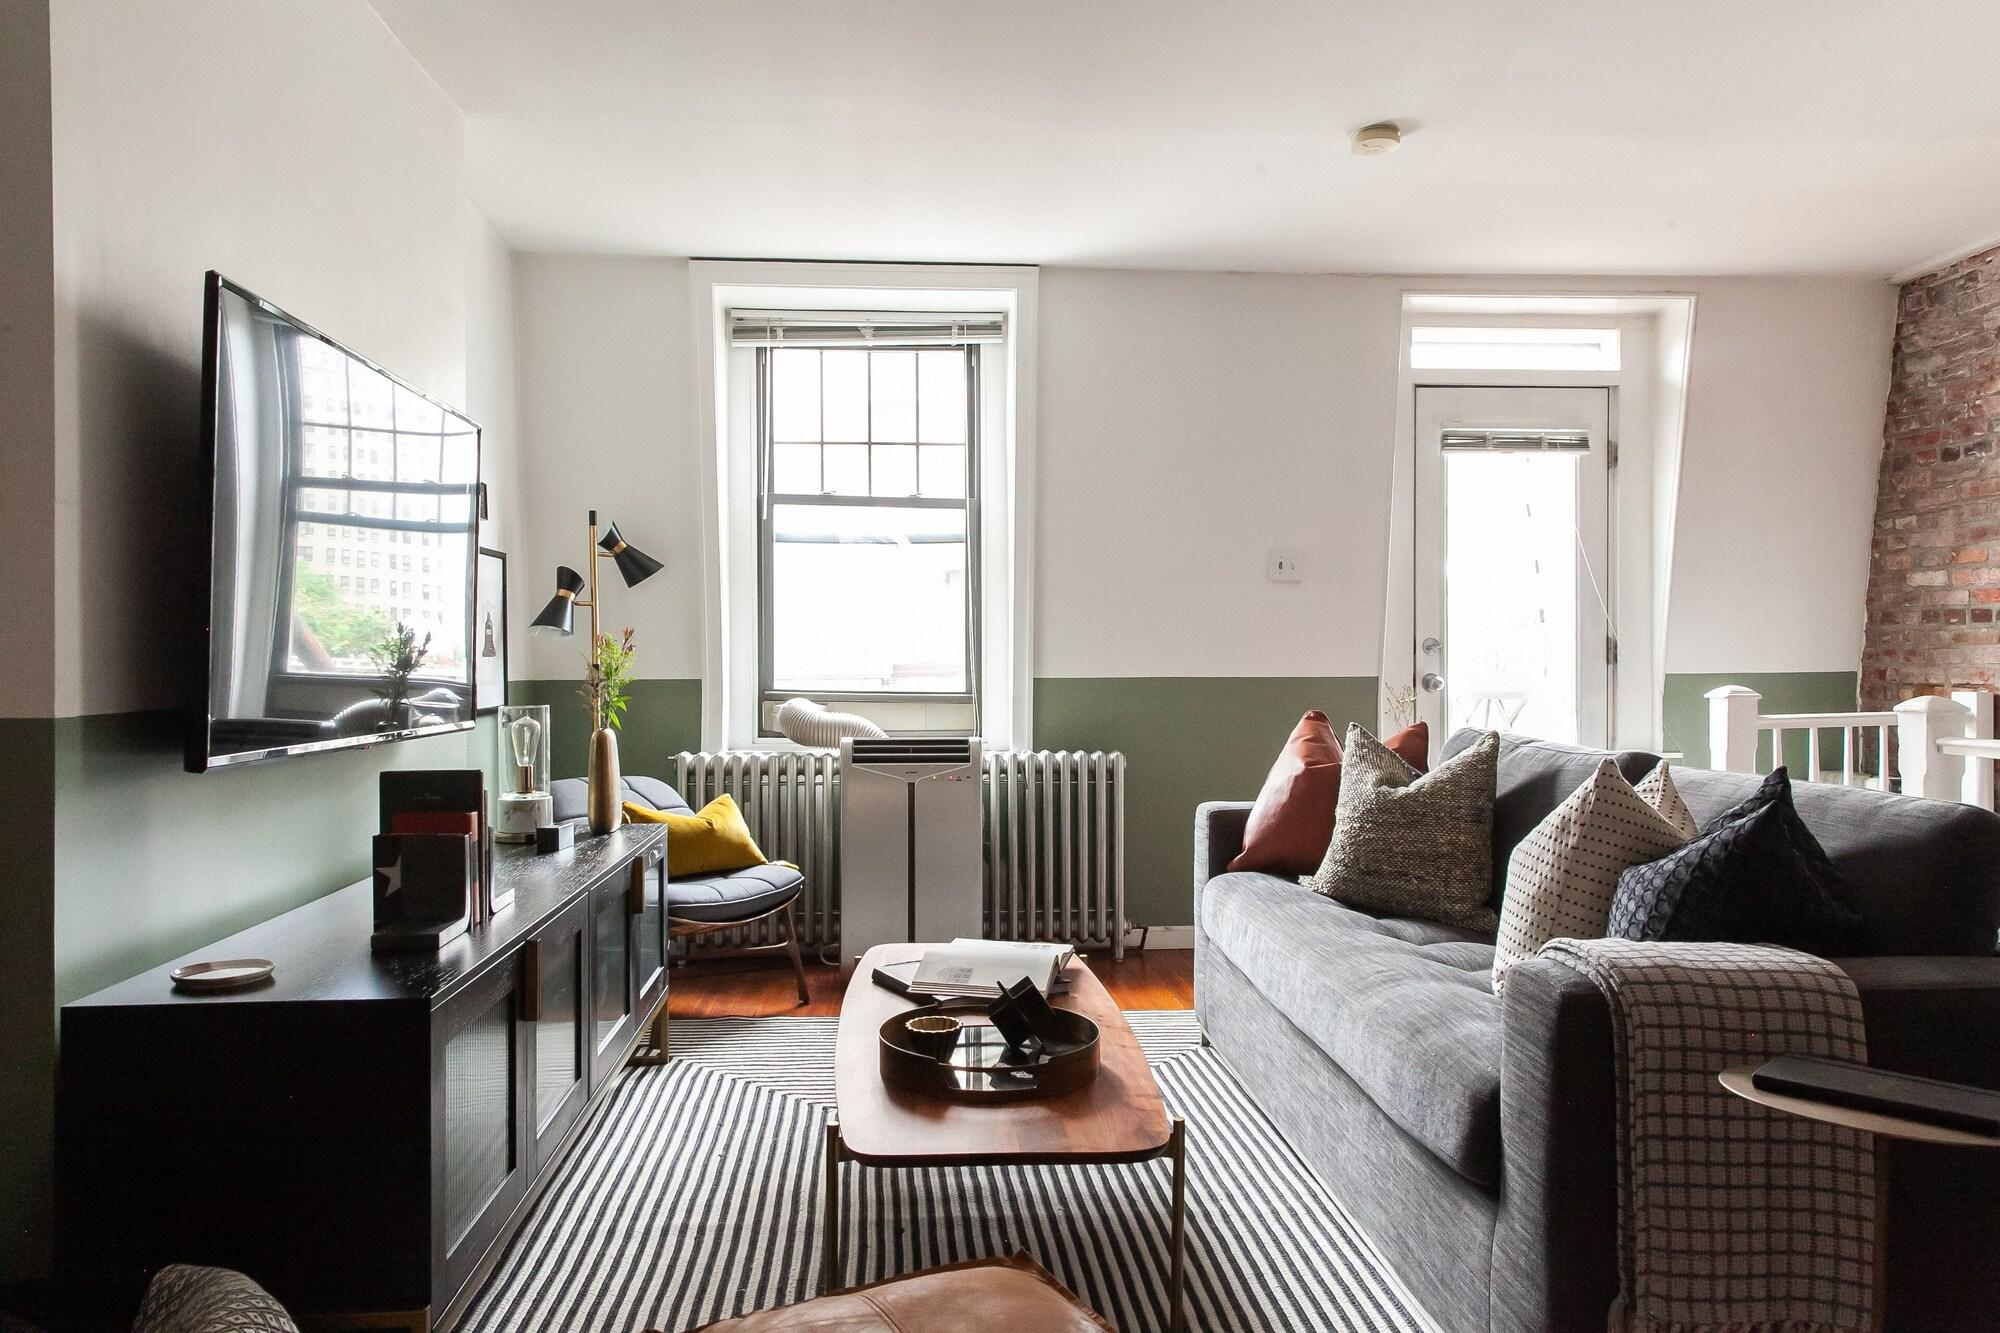 Domio Rittenhouse Square Charming 3BR Duplex Deck